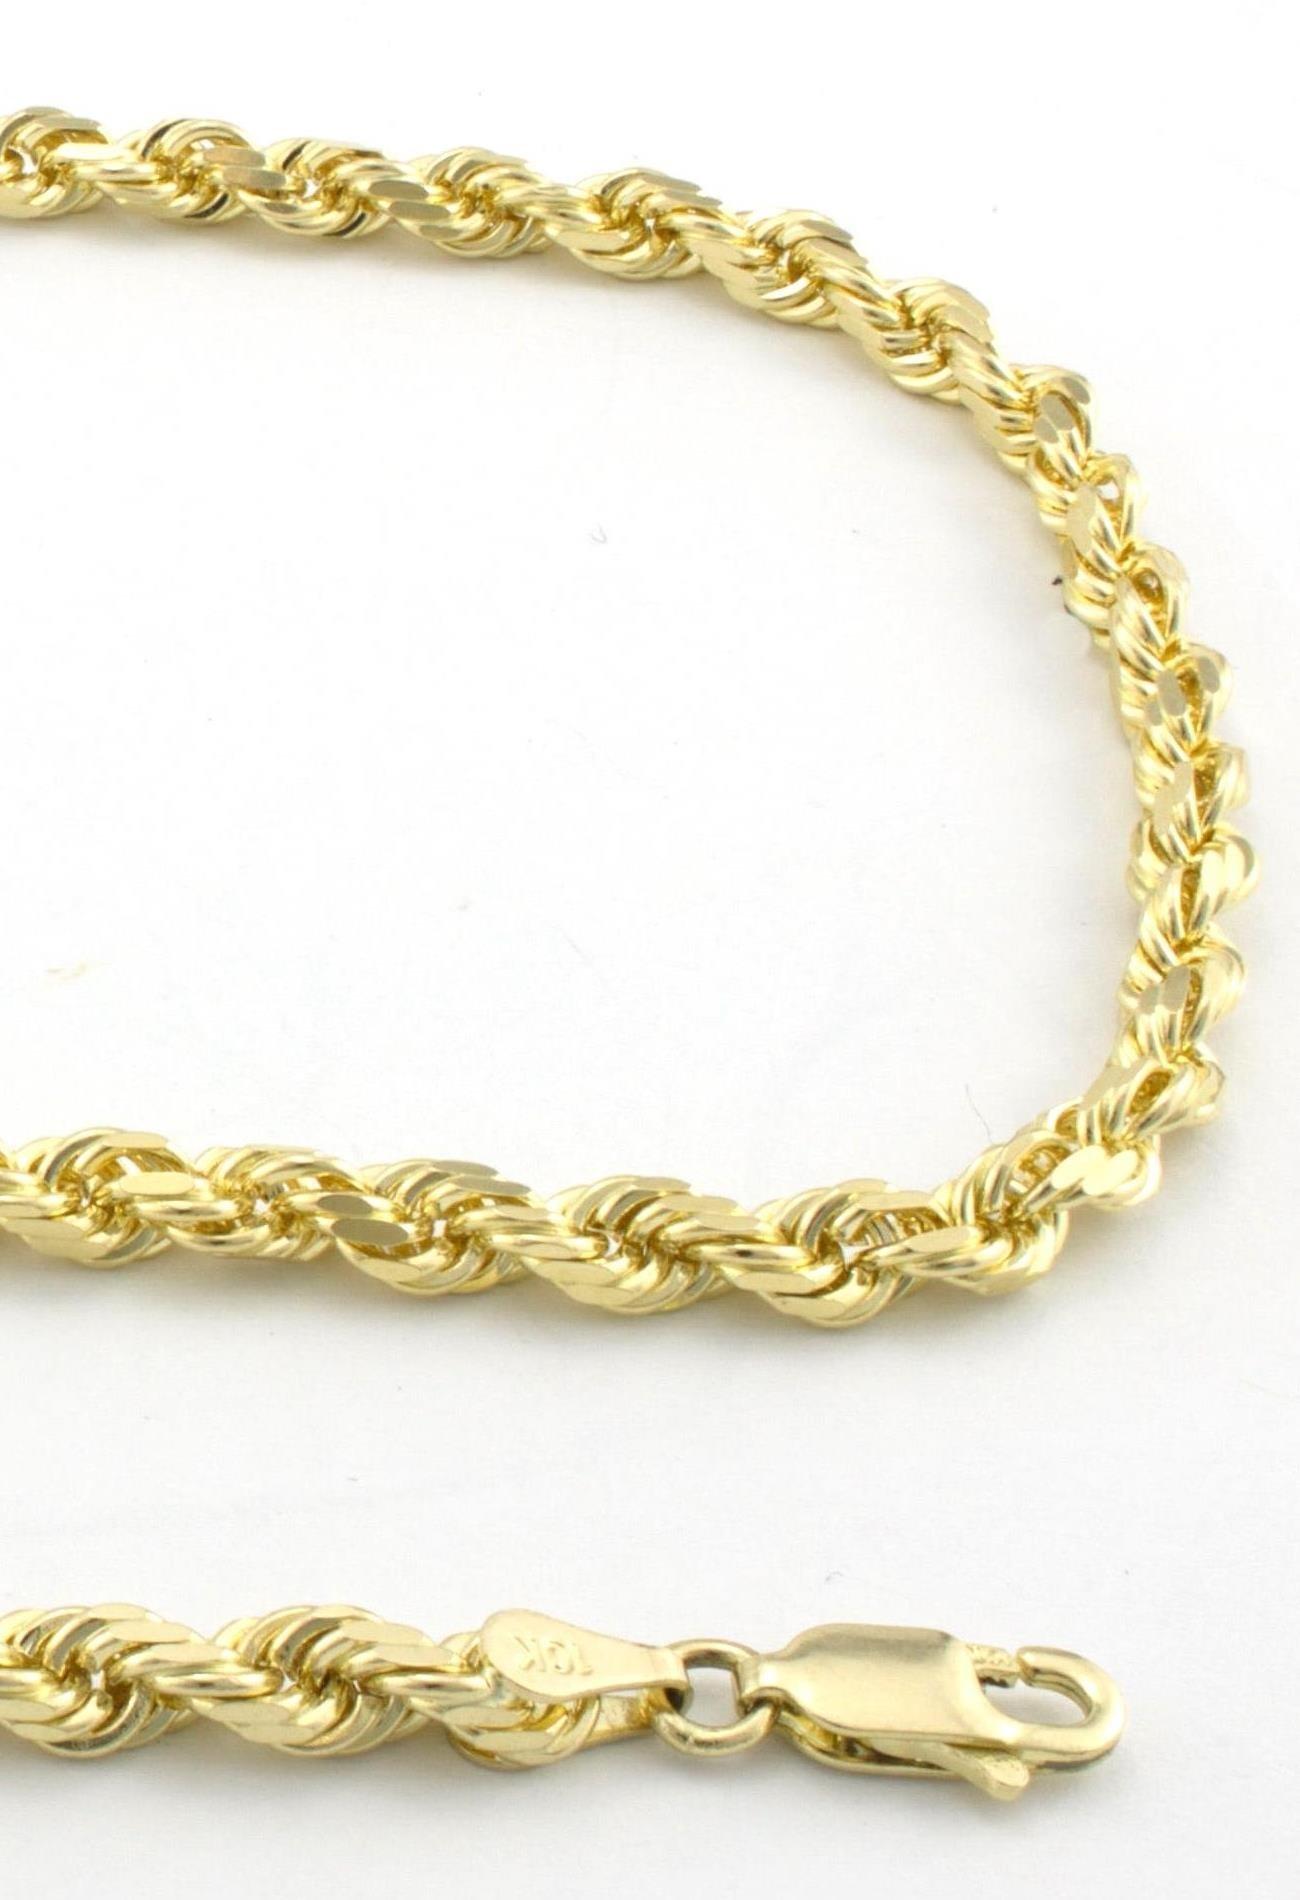 18K Gold 3MM Diamond Cut Rope Chain Necklace Unisex Sizes 16''-30''-22''- 18 Karat Gold by PORI JEWELERS (Image #2)